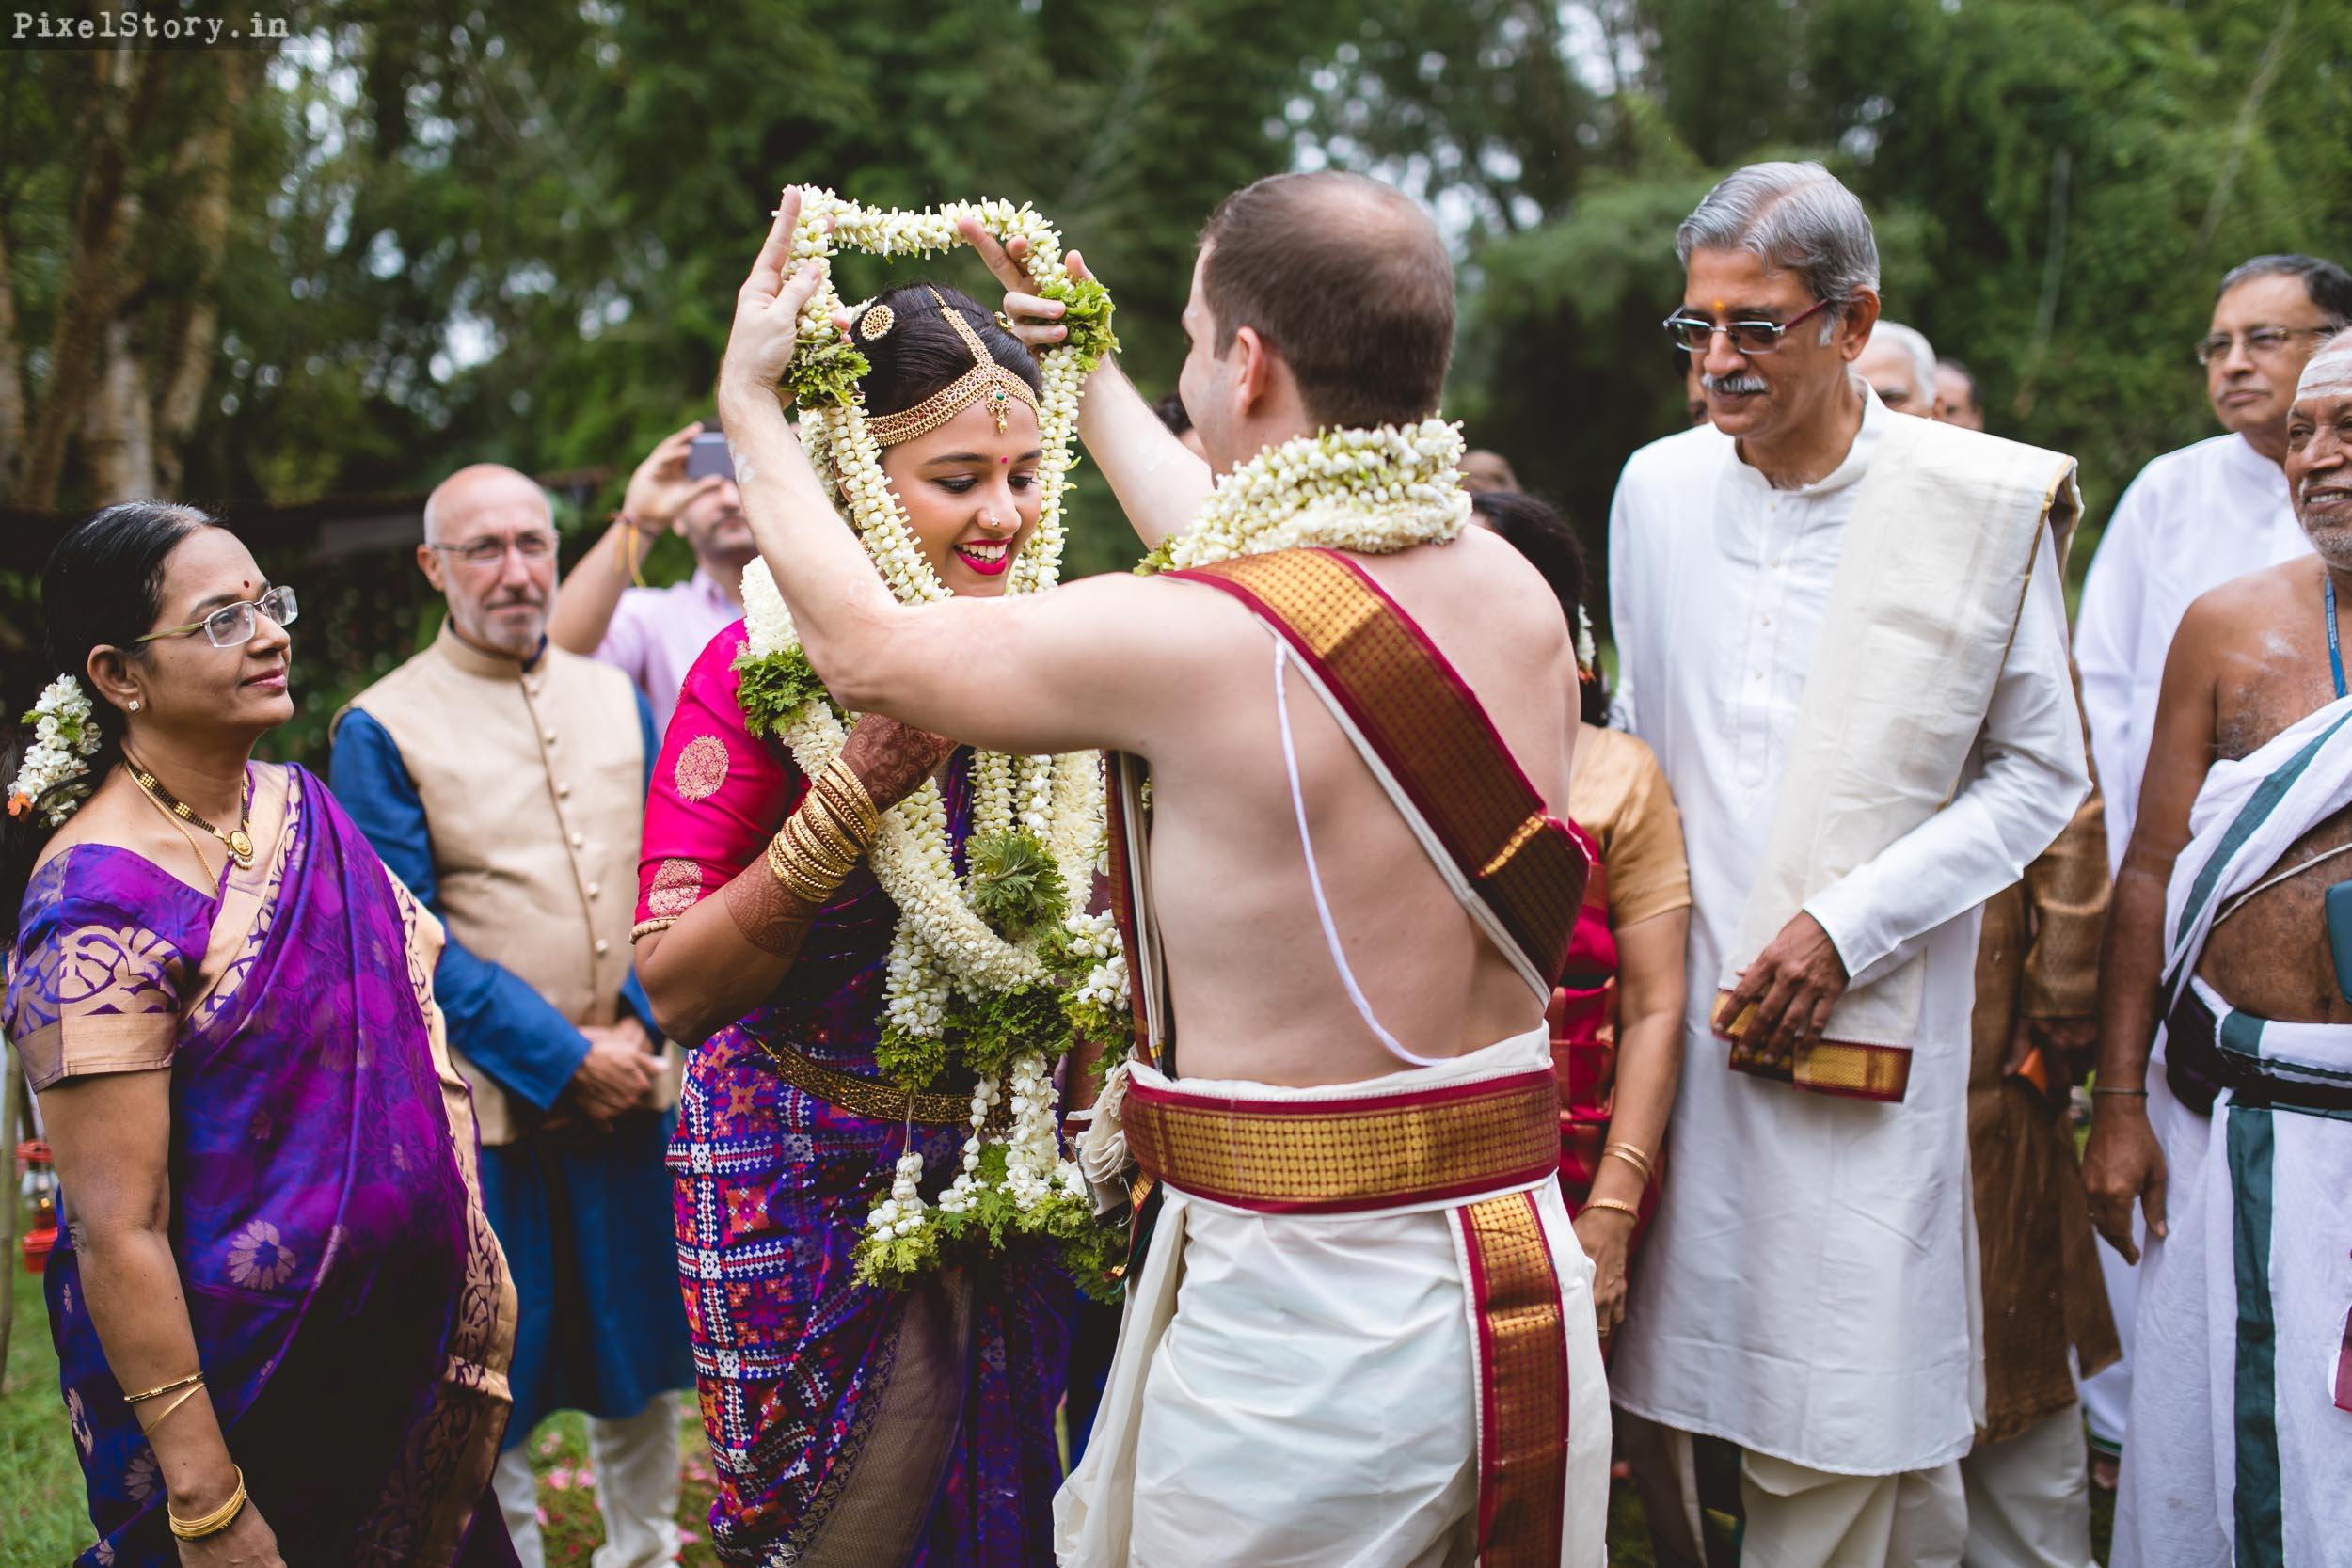 PixelStory-Jungle-Wedding-Photographer-Masinagudi-Indo-French031.jpg